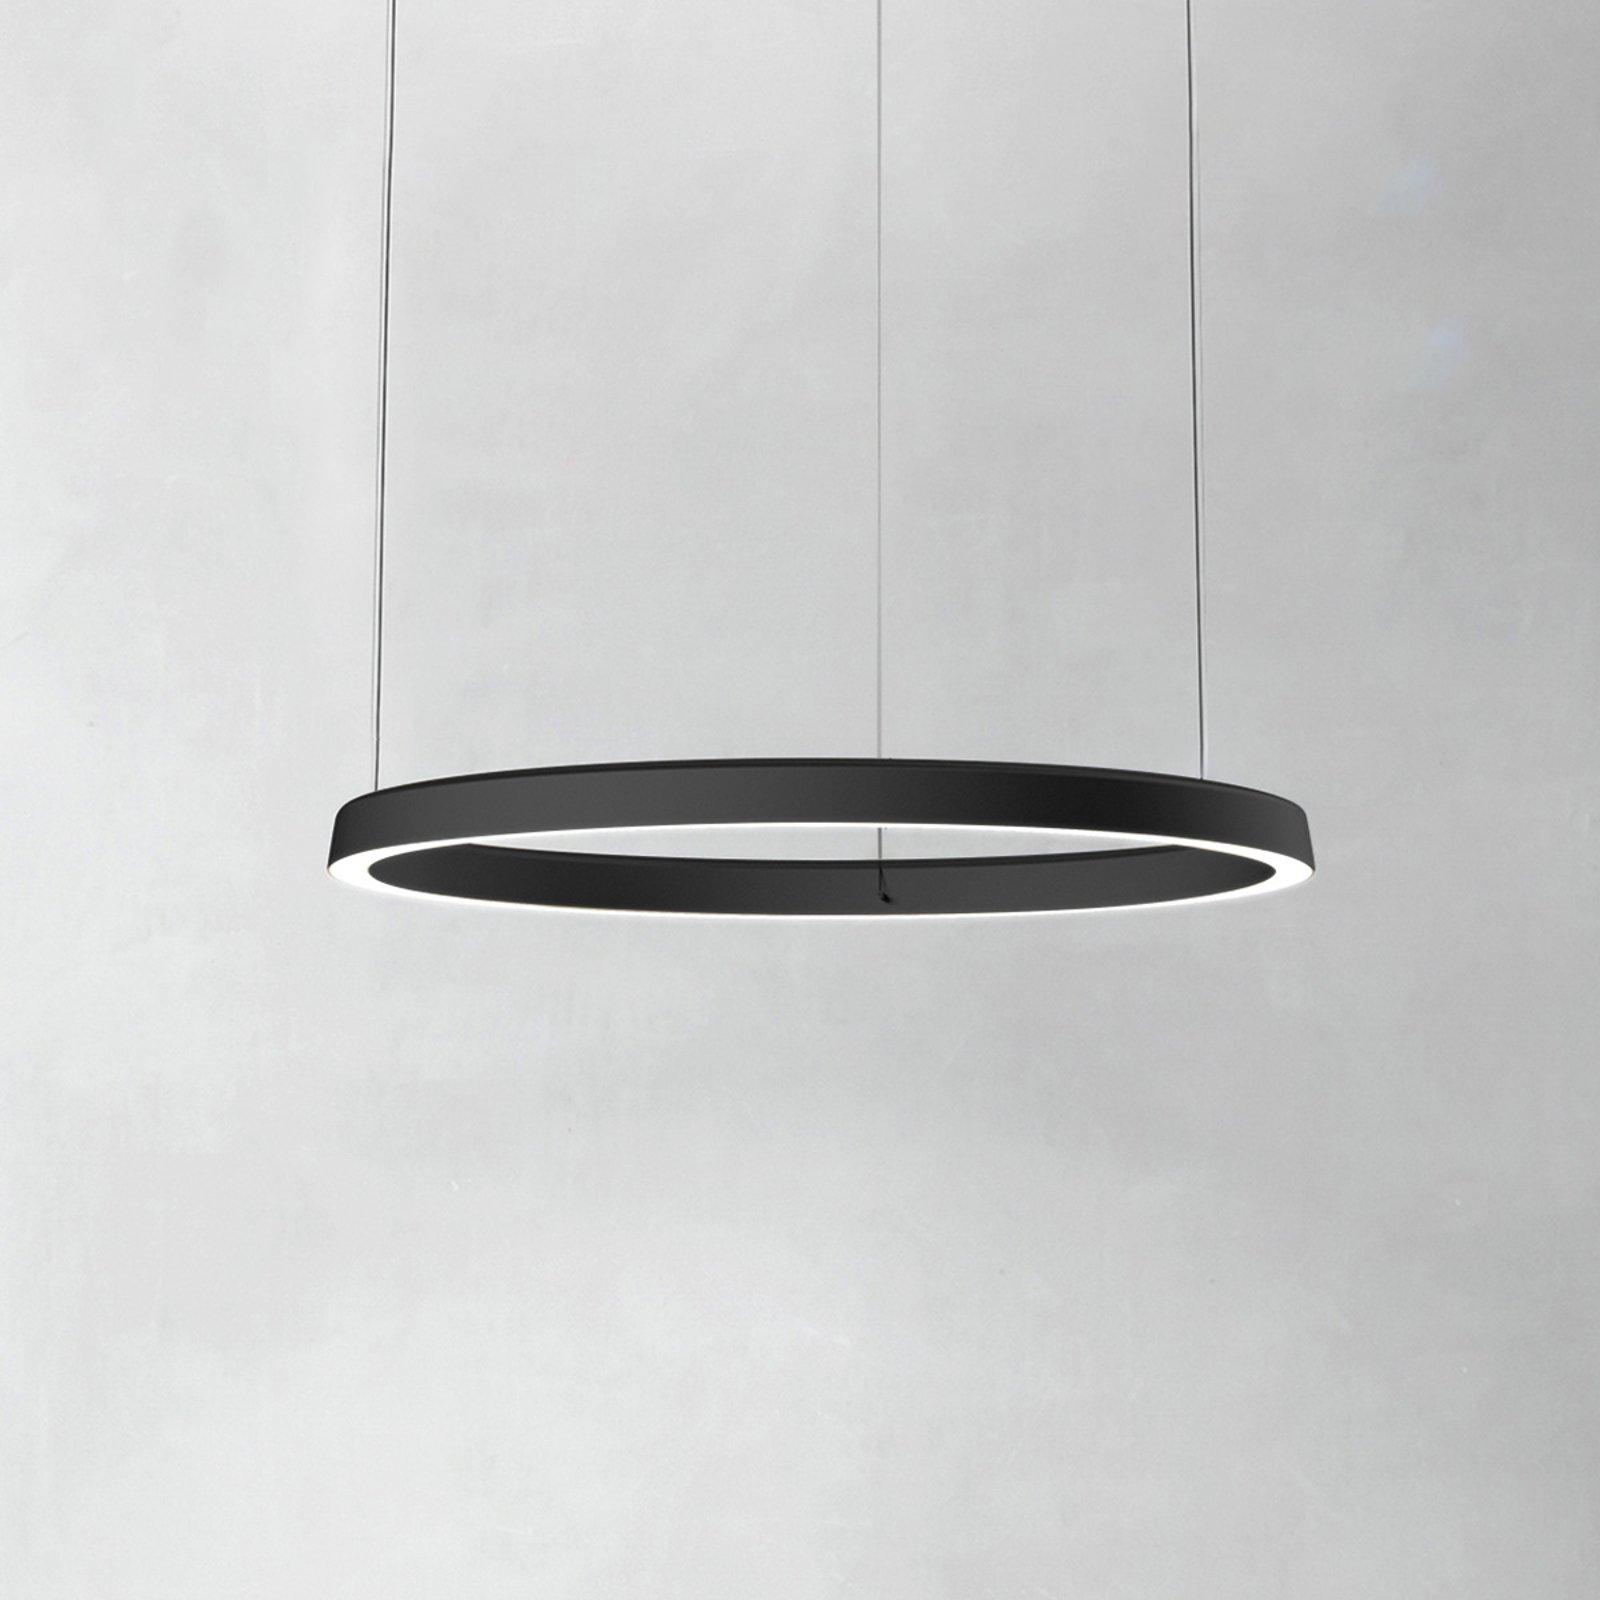 Luceplan Compendium Circle 72 cm, svart